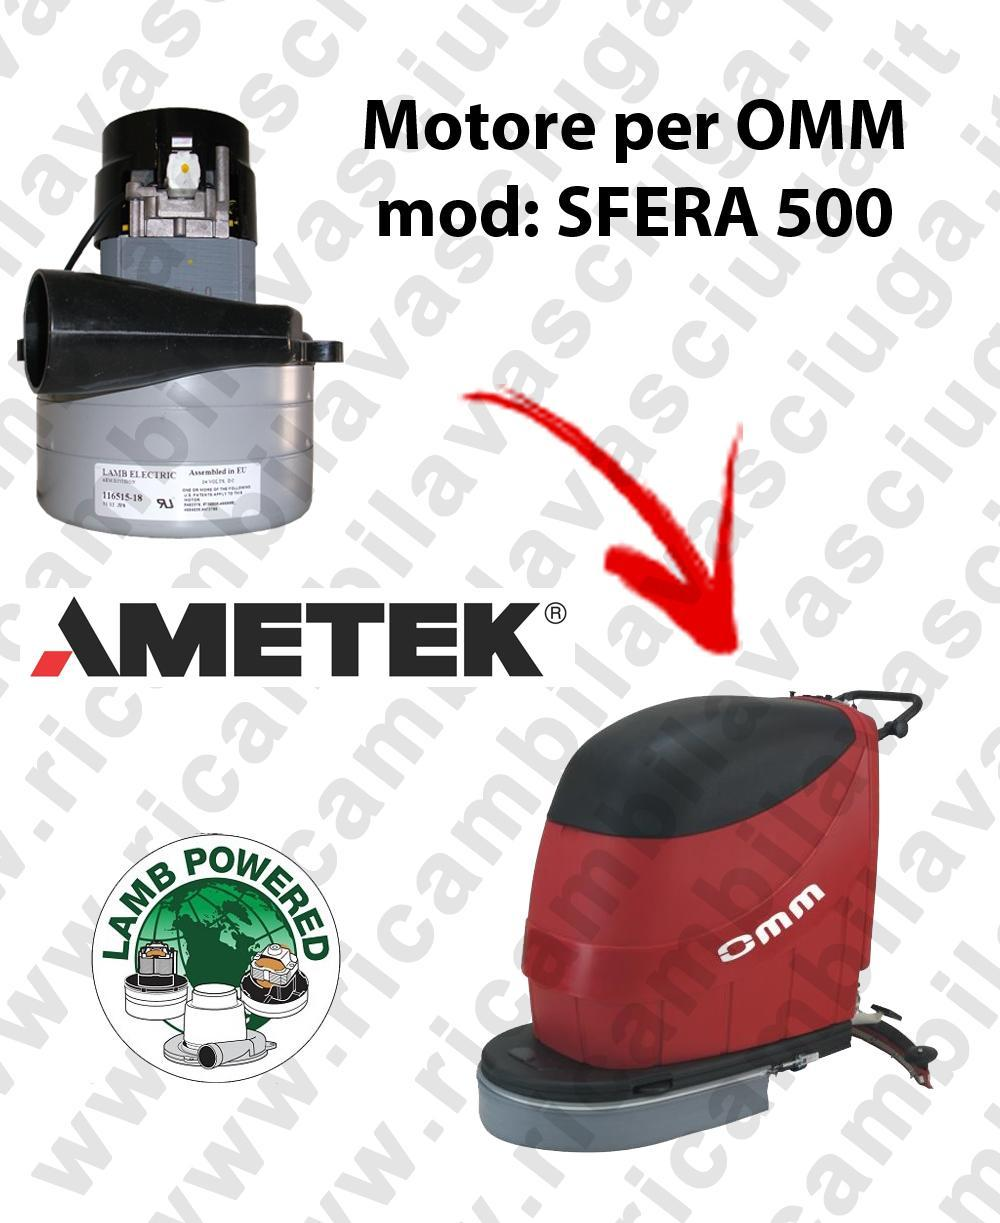 SFERA 500 Motore de aspiración LAMB AMETEK para fregadora OMM